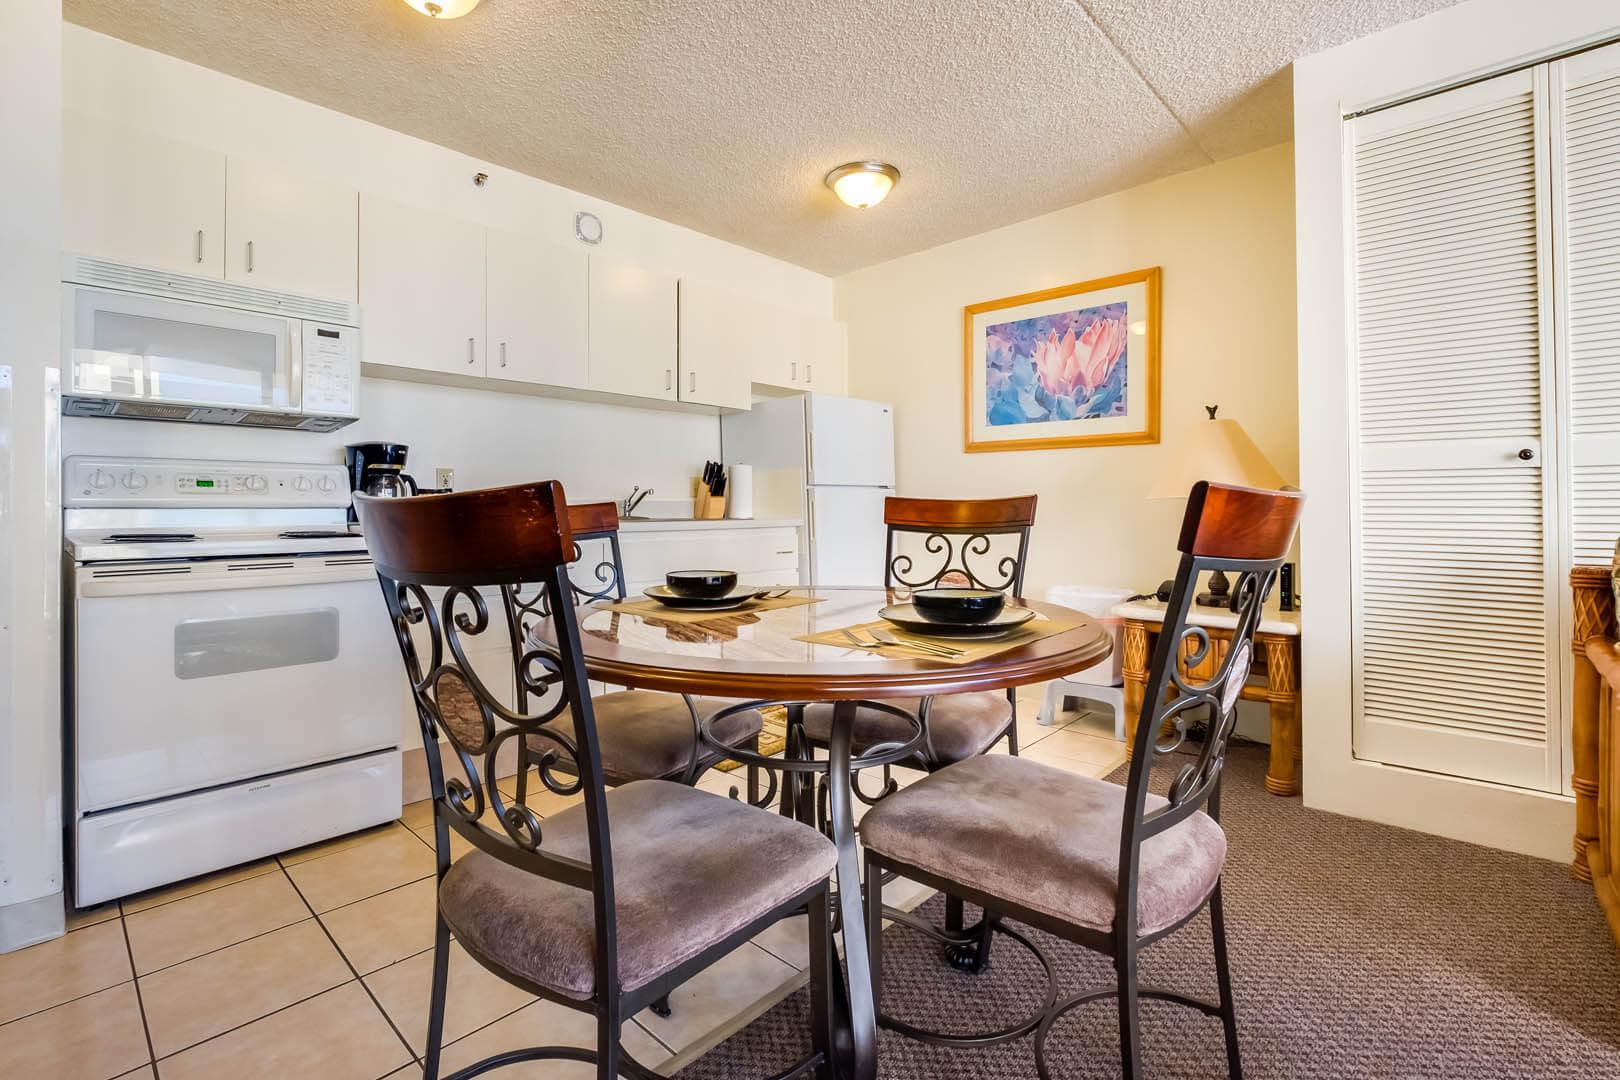 A spacious kitchen and dining table at VRI's Hawaiian Sun Holidays in Honolulu, Hawaii.